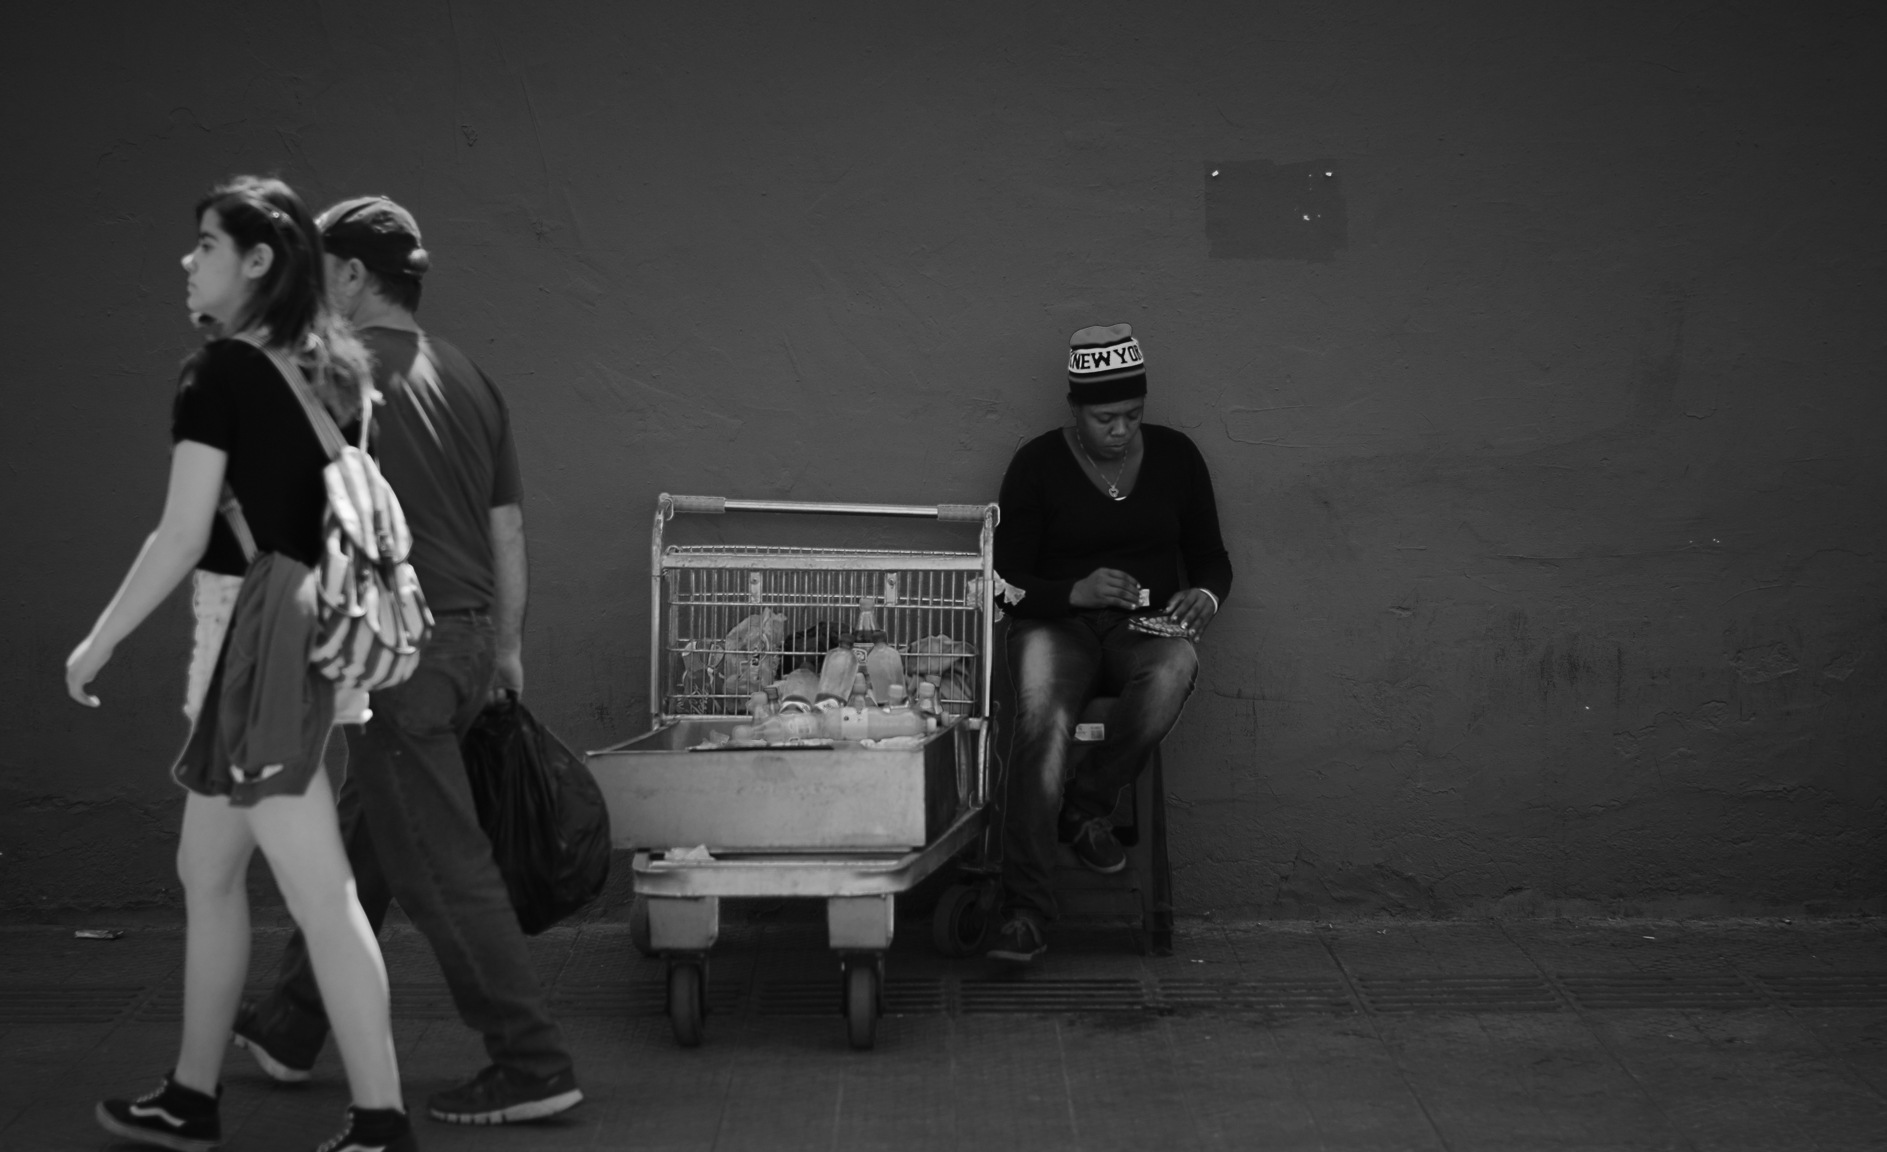 Stgo 261016 by Eduardo Gomez